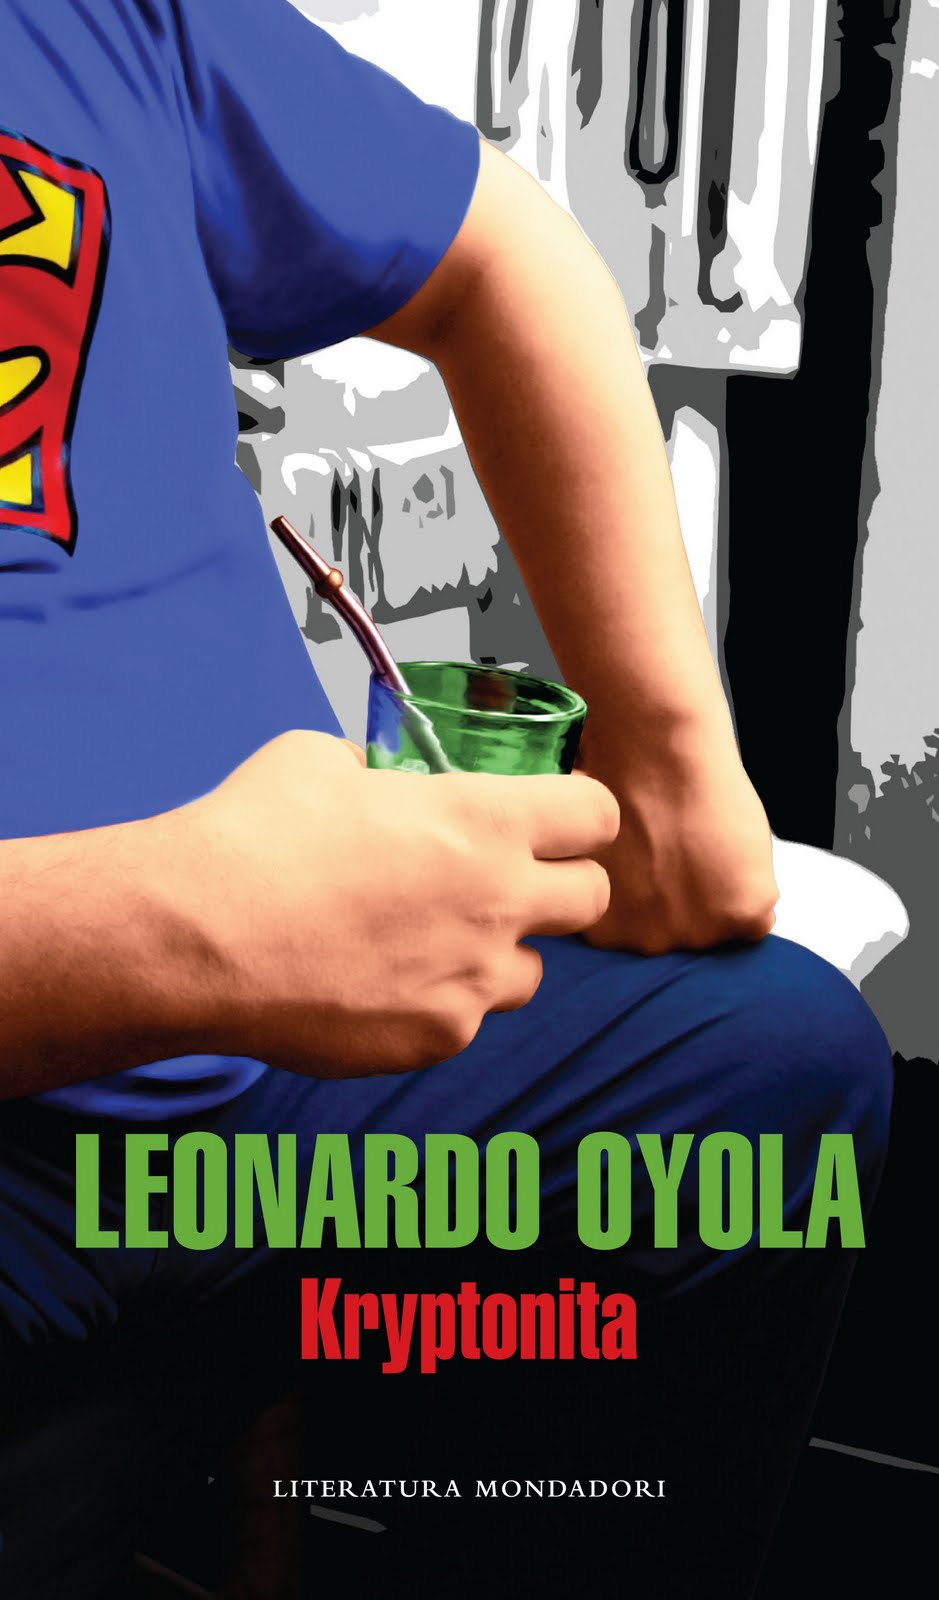 Kryptonita tapa